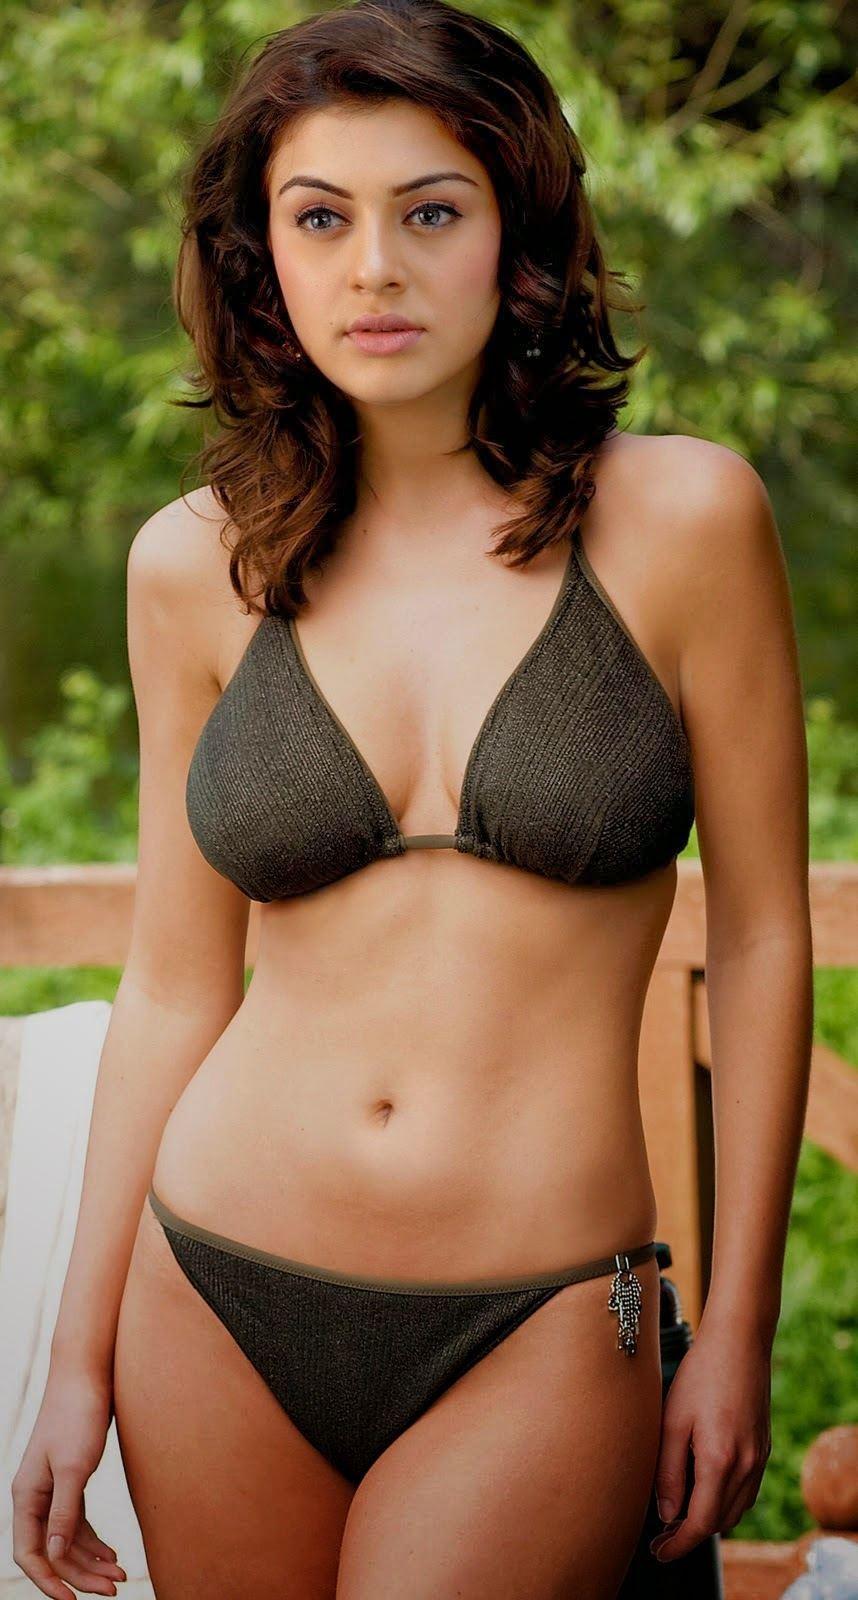 Hansika Motwani hot photos and bikini pics